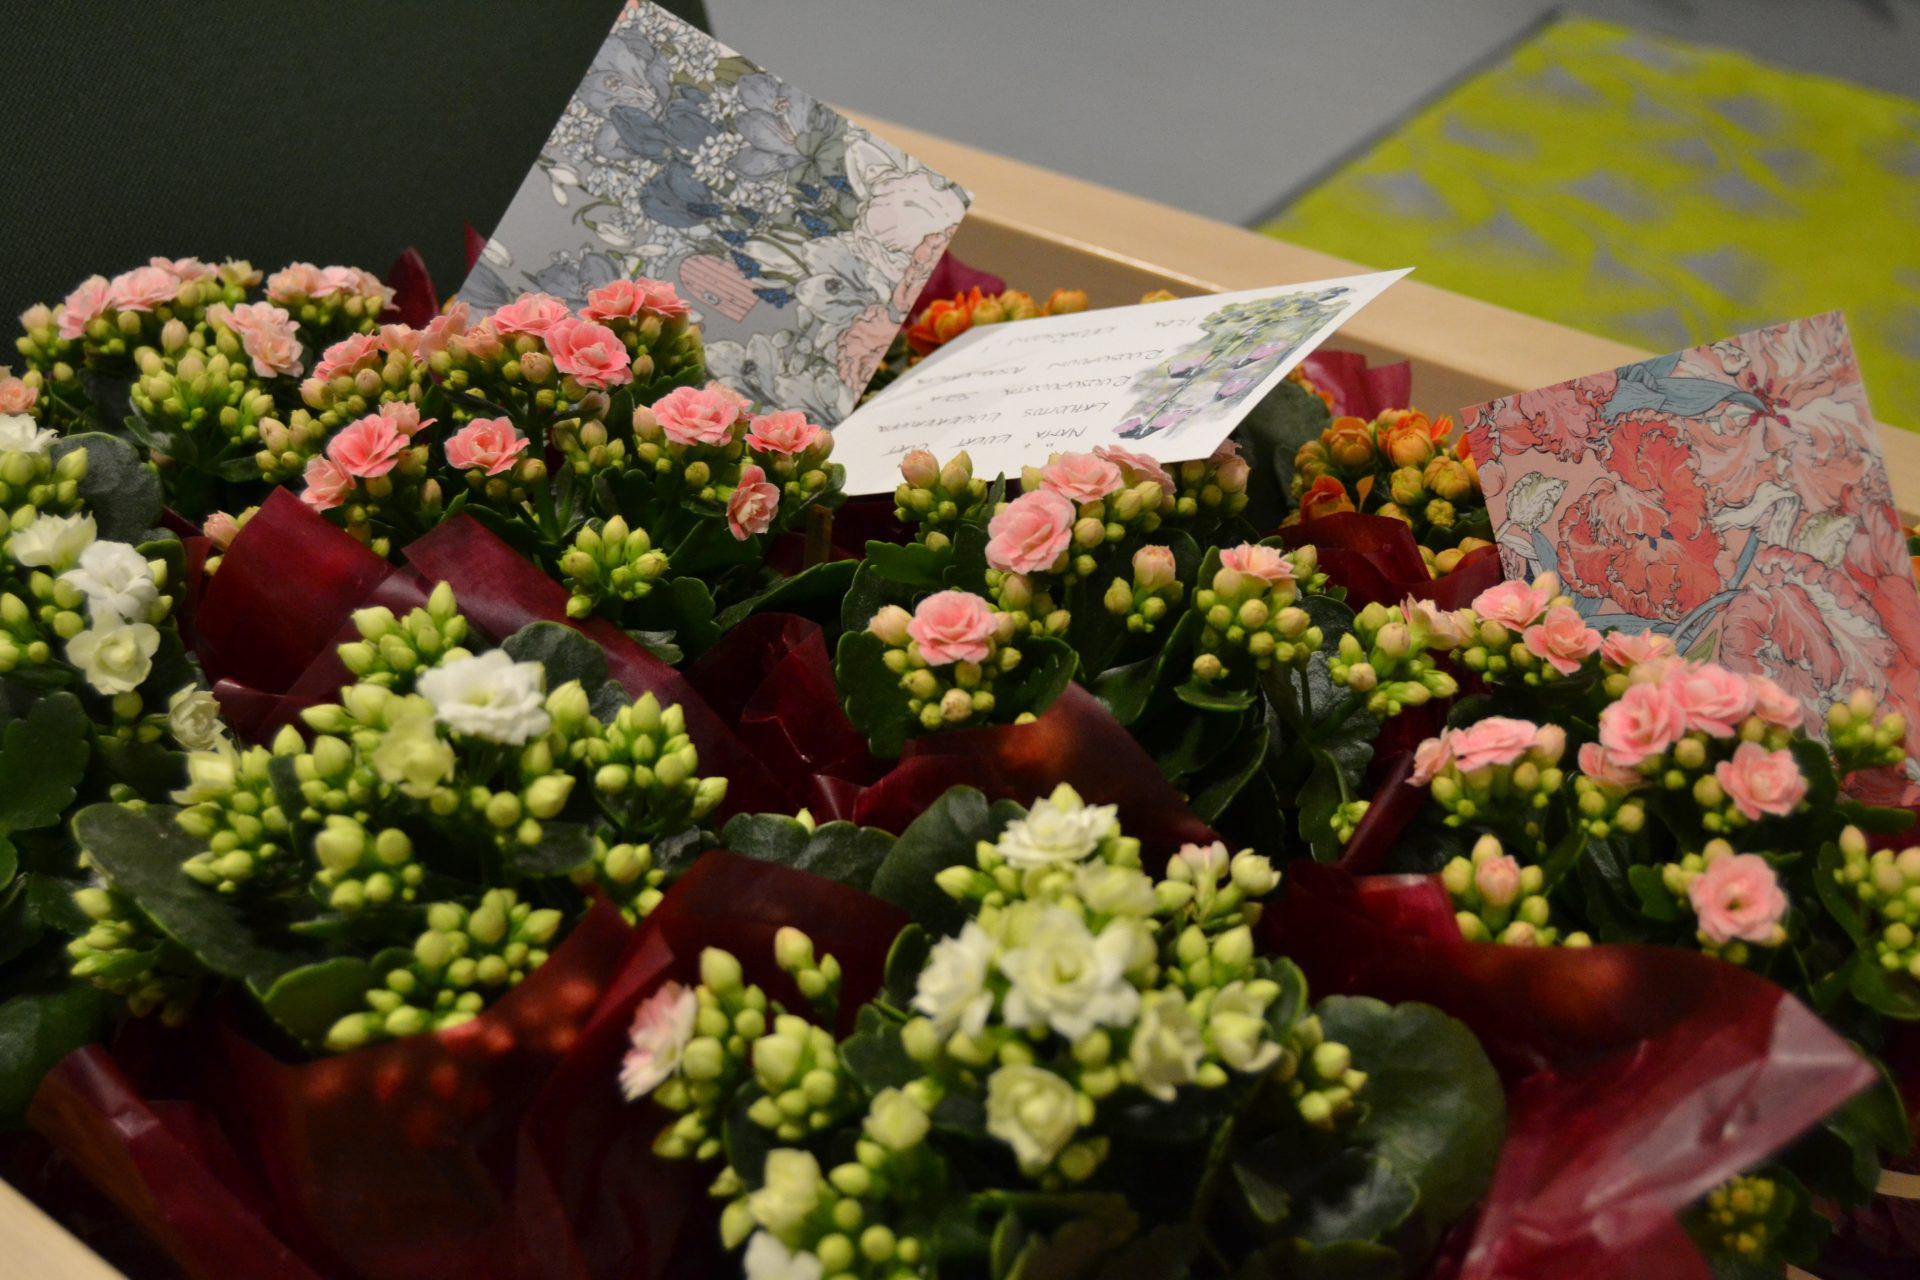 Viitakotiin saapui taas ihania kukkasia!